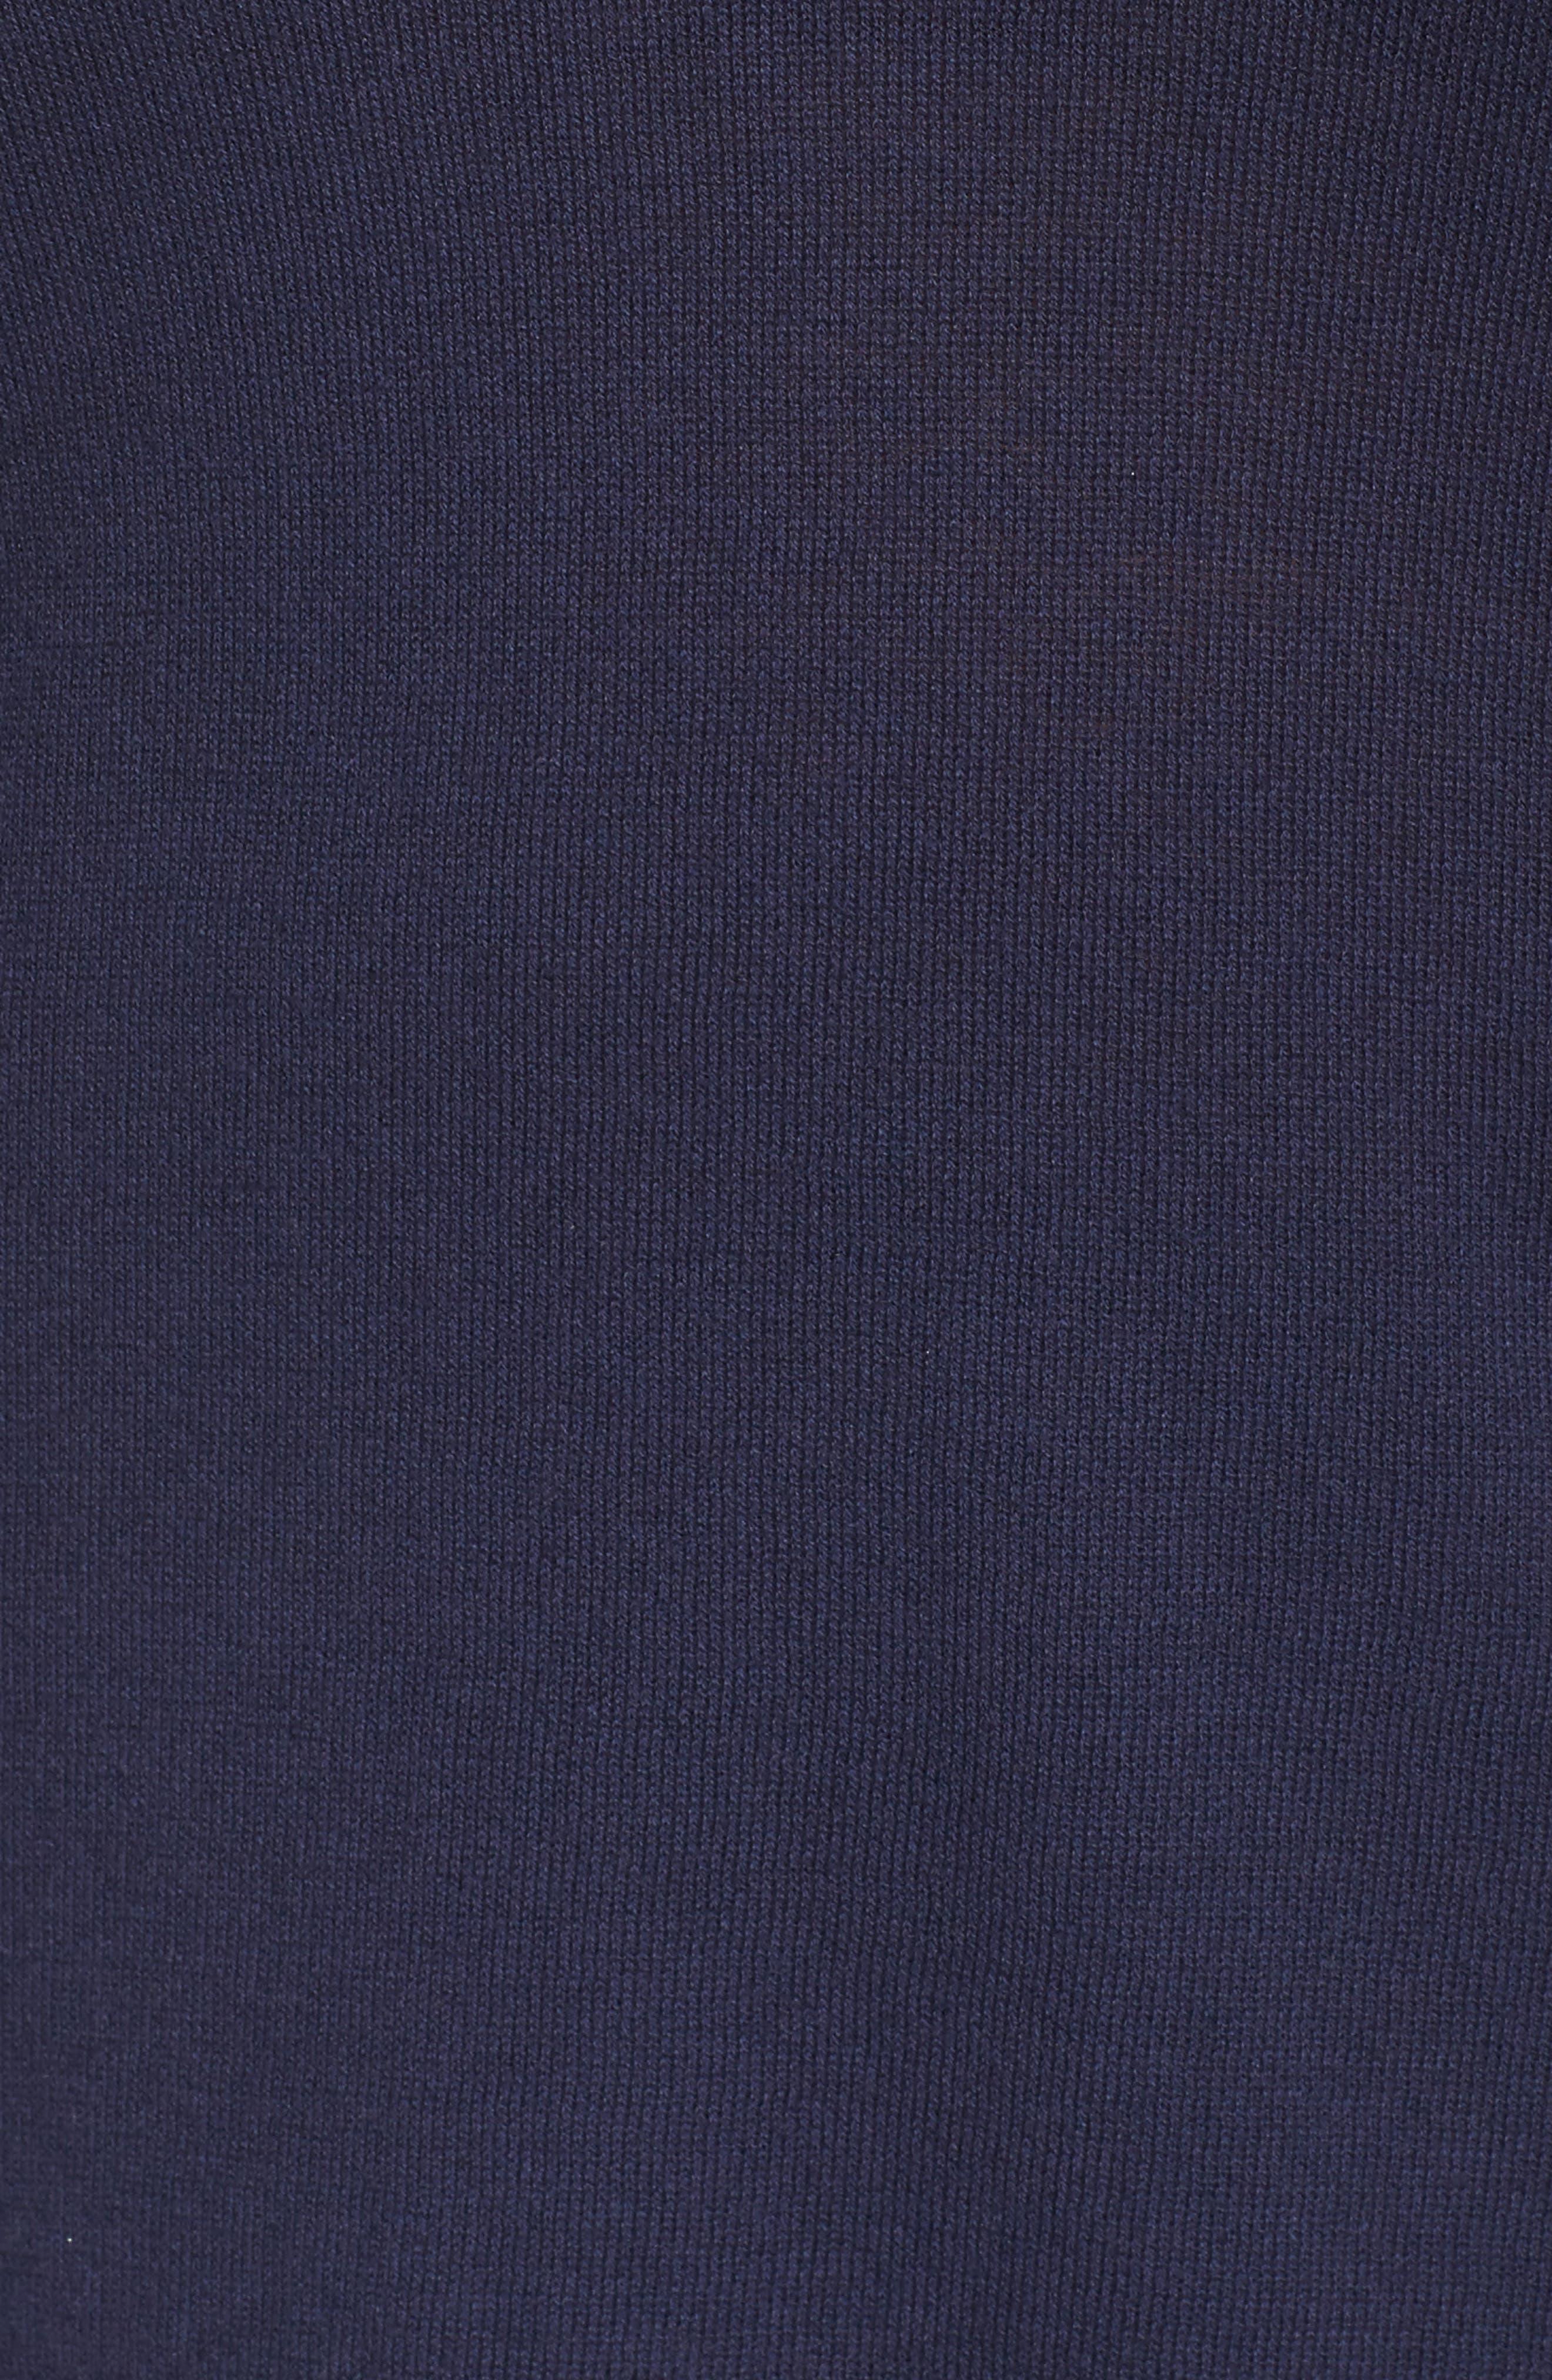 Mix Media Sweater,                             Alternate thumbnail 5, color,                             Navy- White Combo